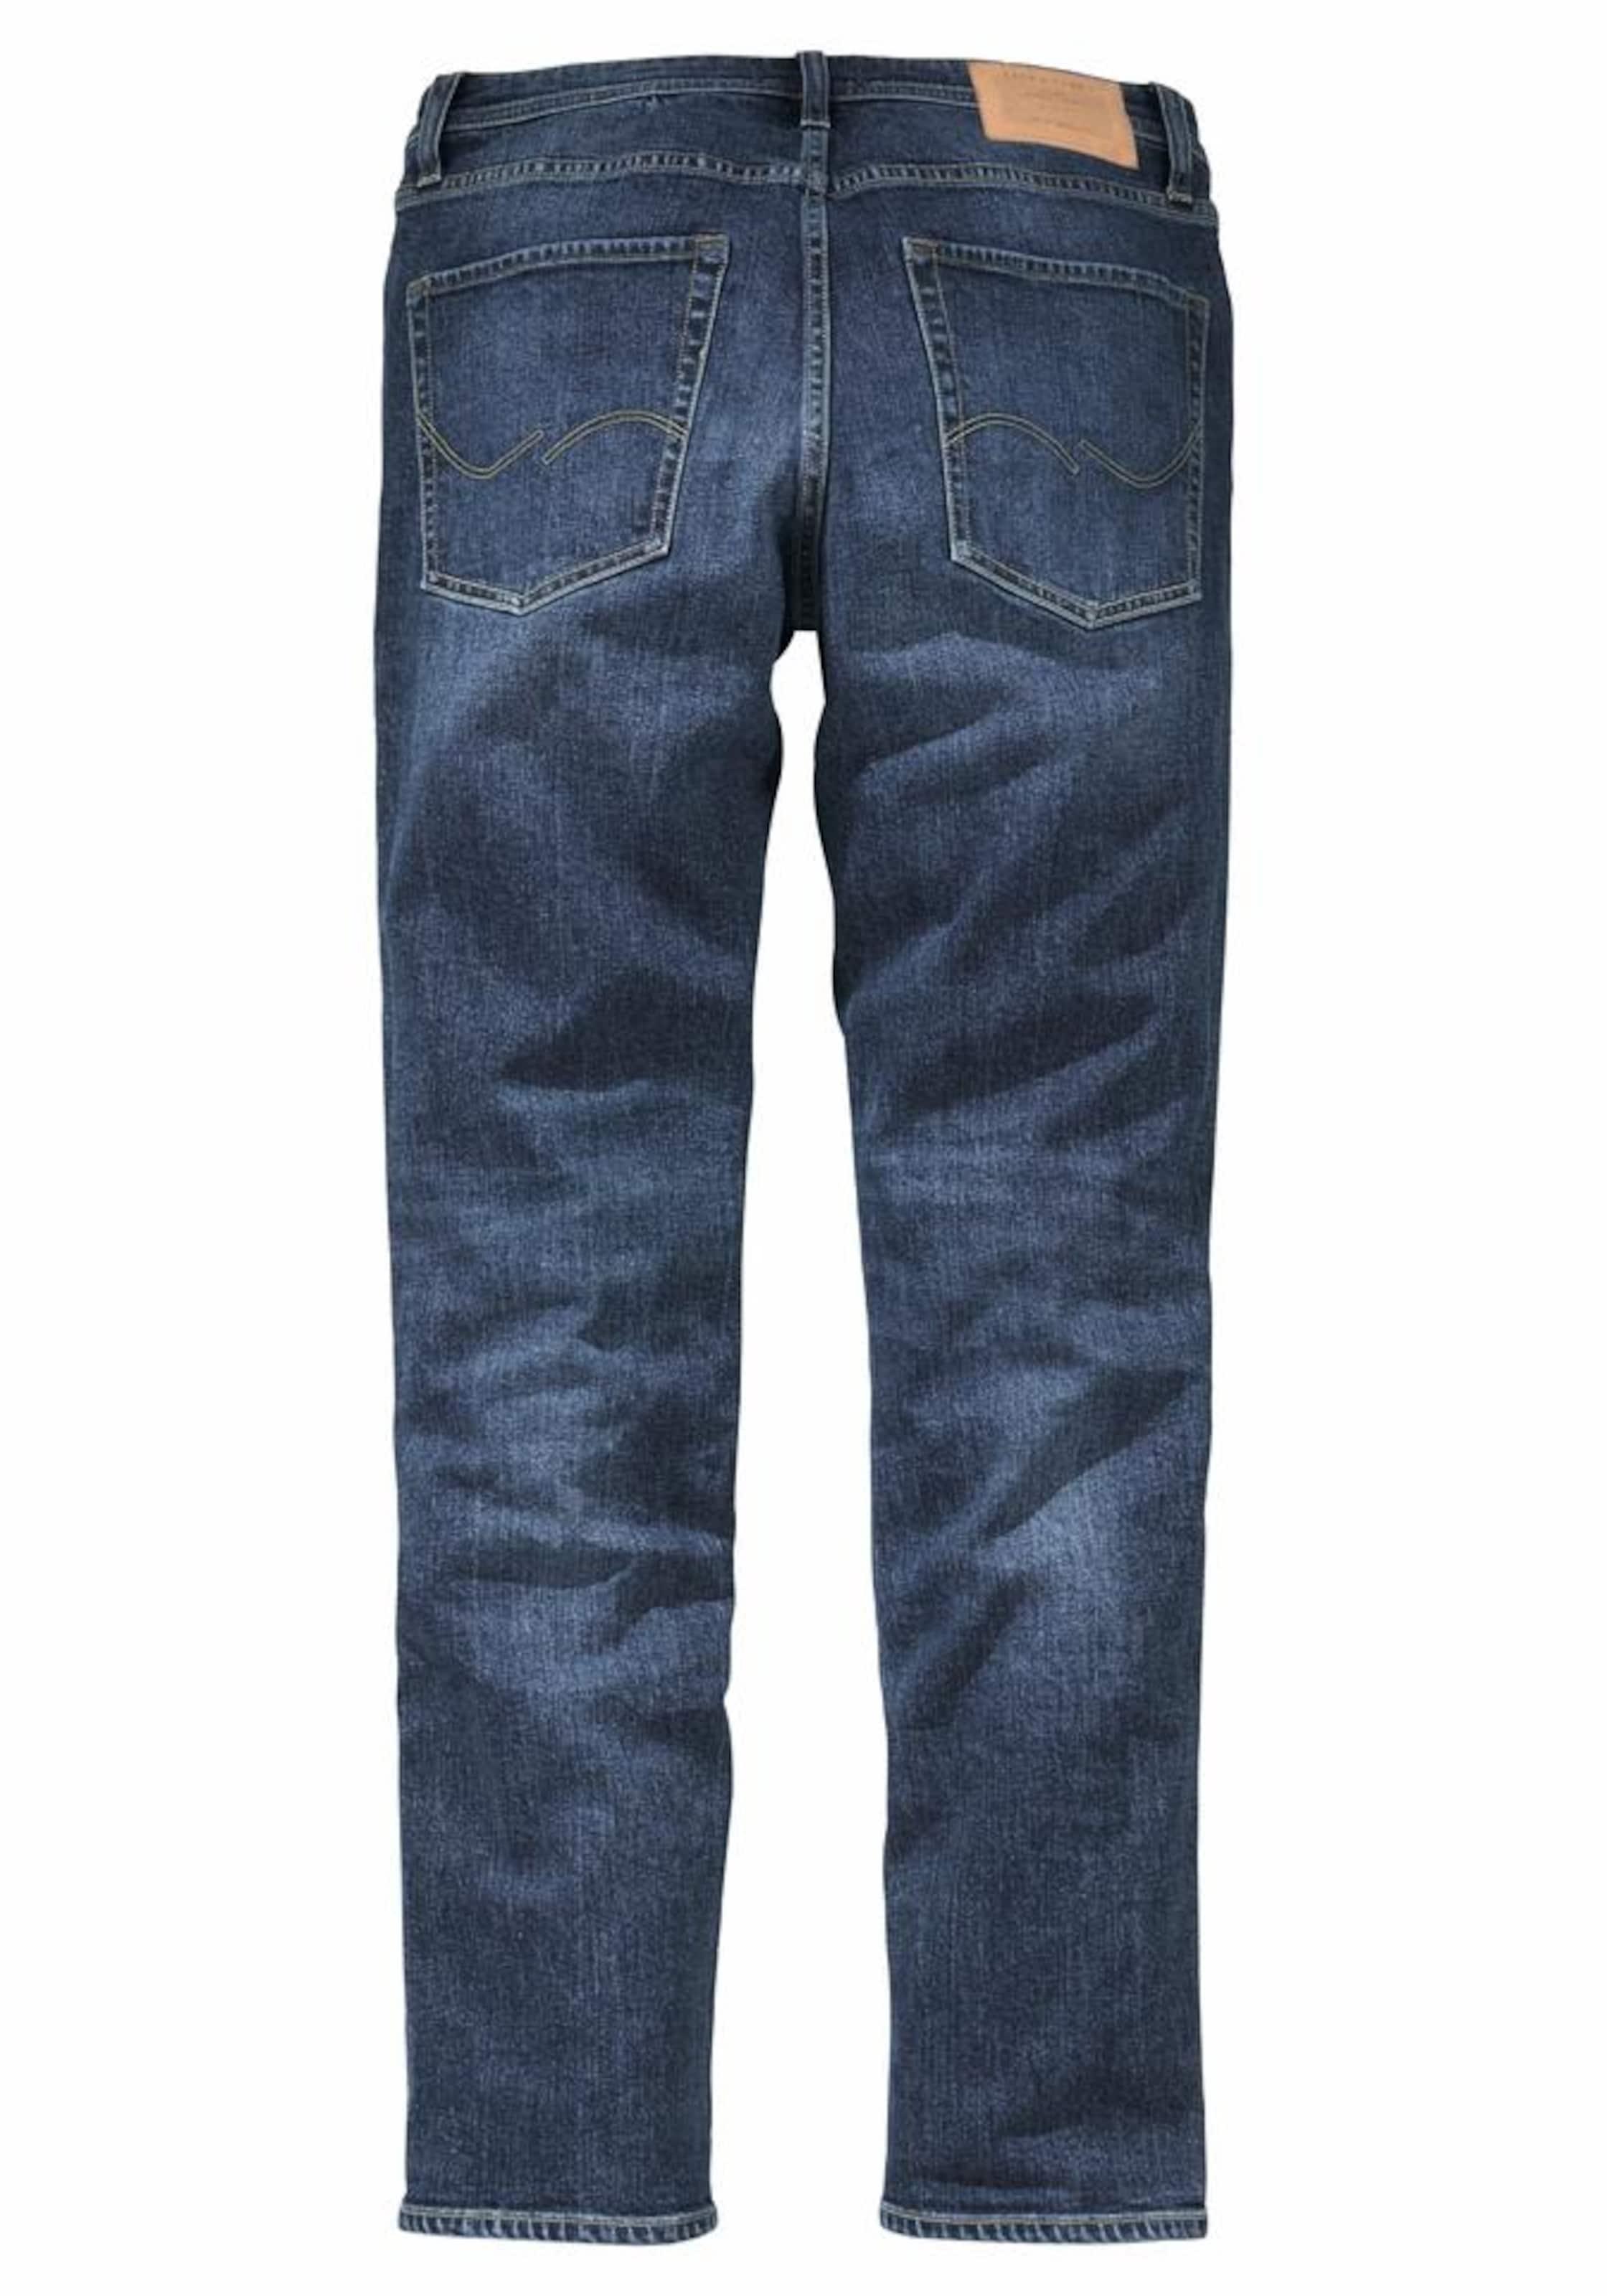 JACK & JONES Slim Fit Jeans 'TIM ORIGINAL CR 010' Neue Ankunft Günstig Online K5nYB9L